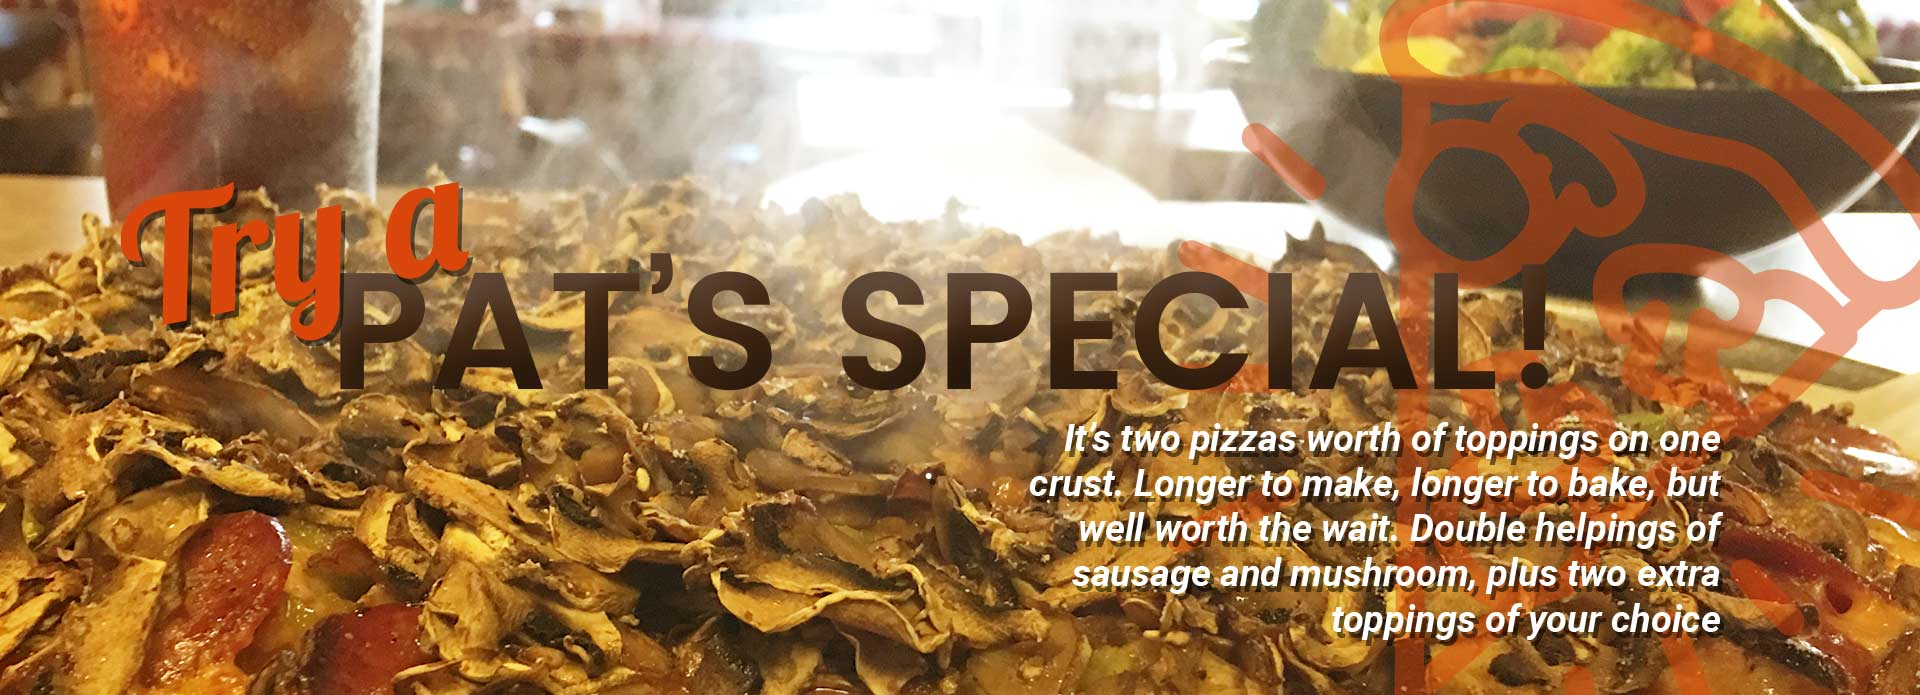 Pats Special at Cranky Pats Pizza